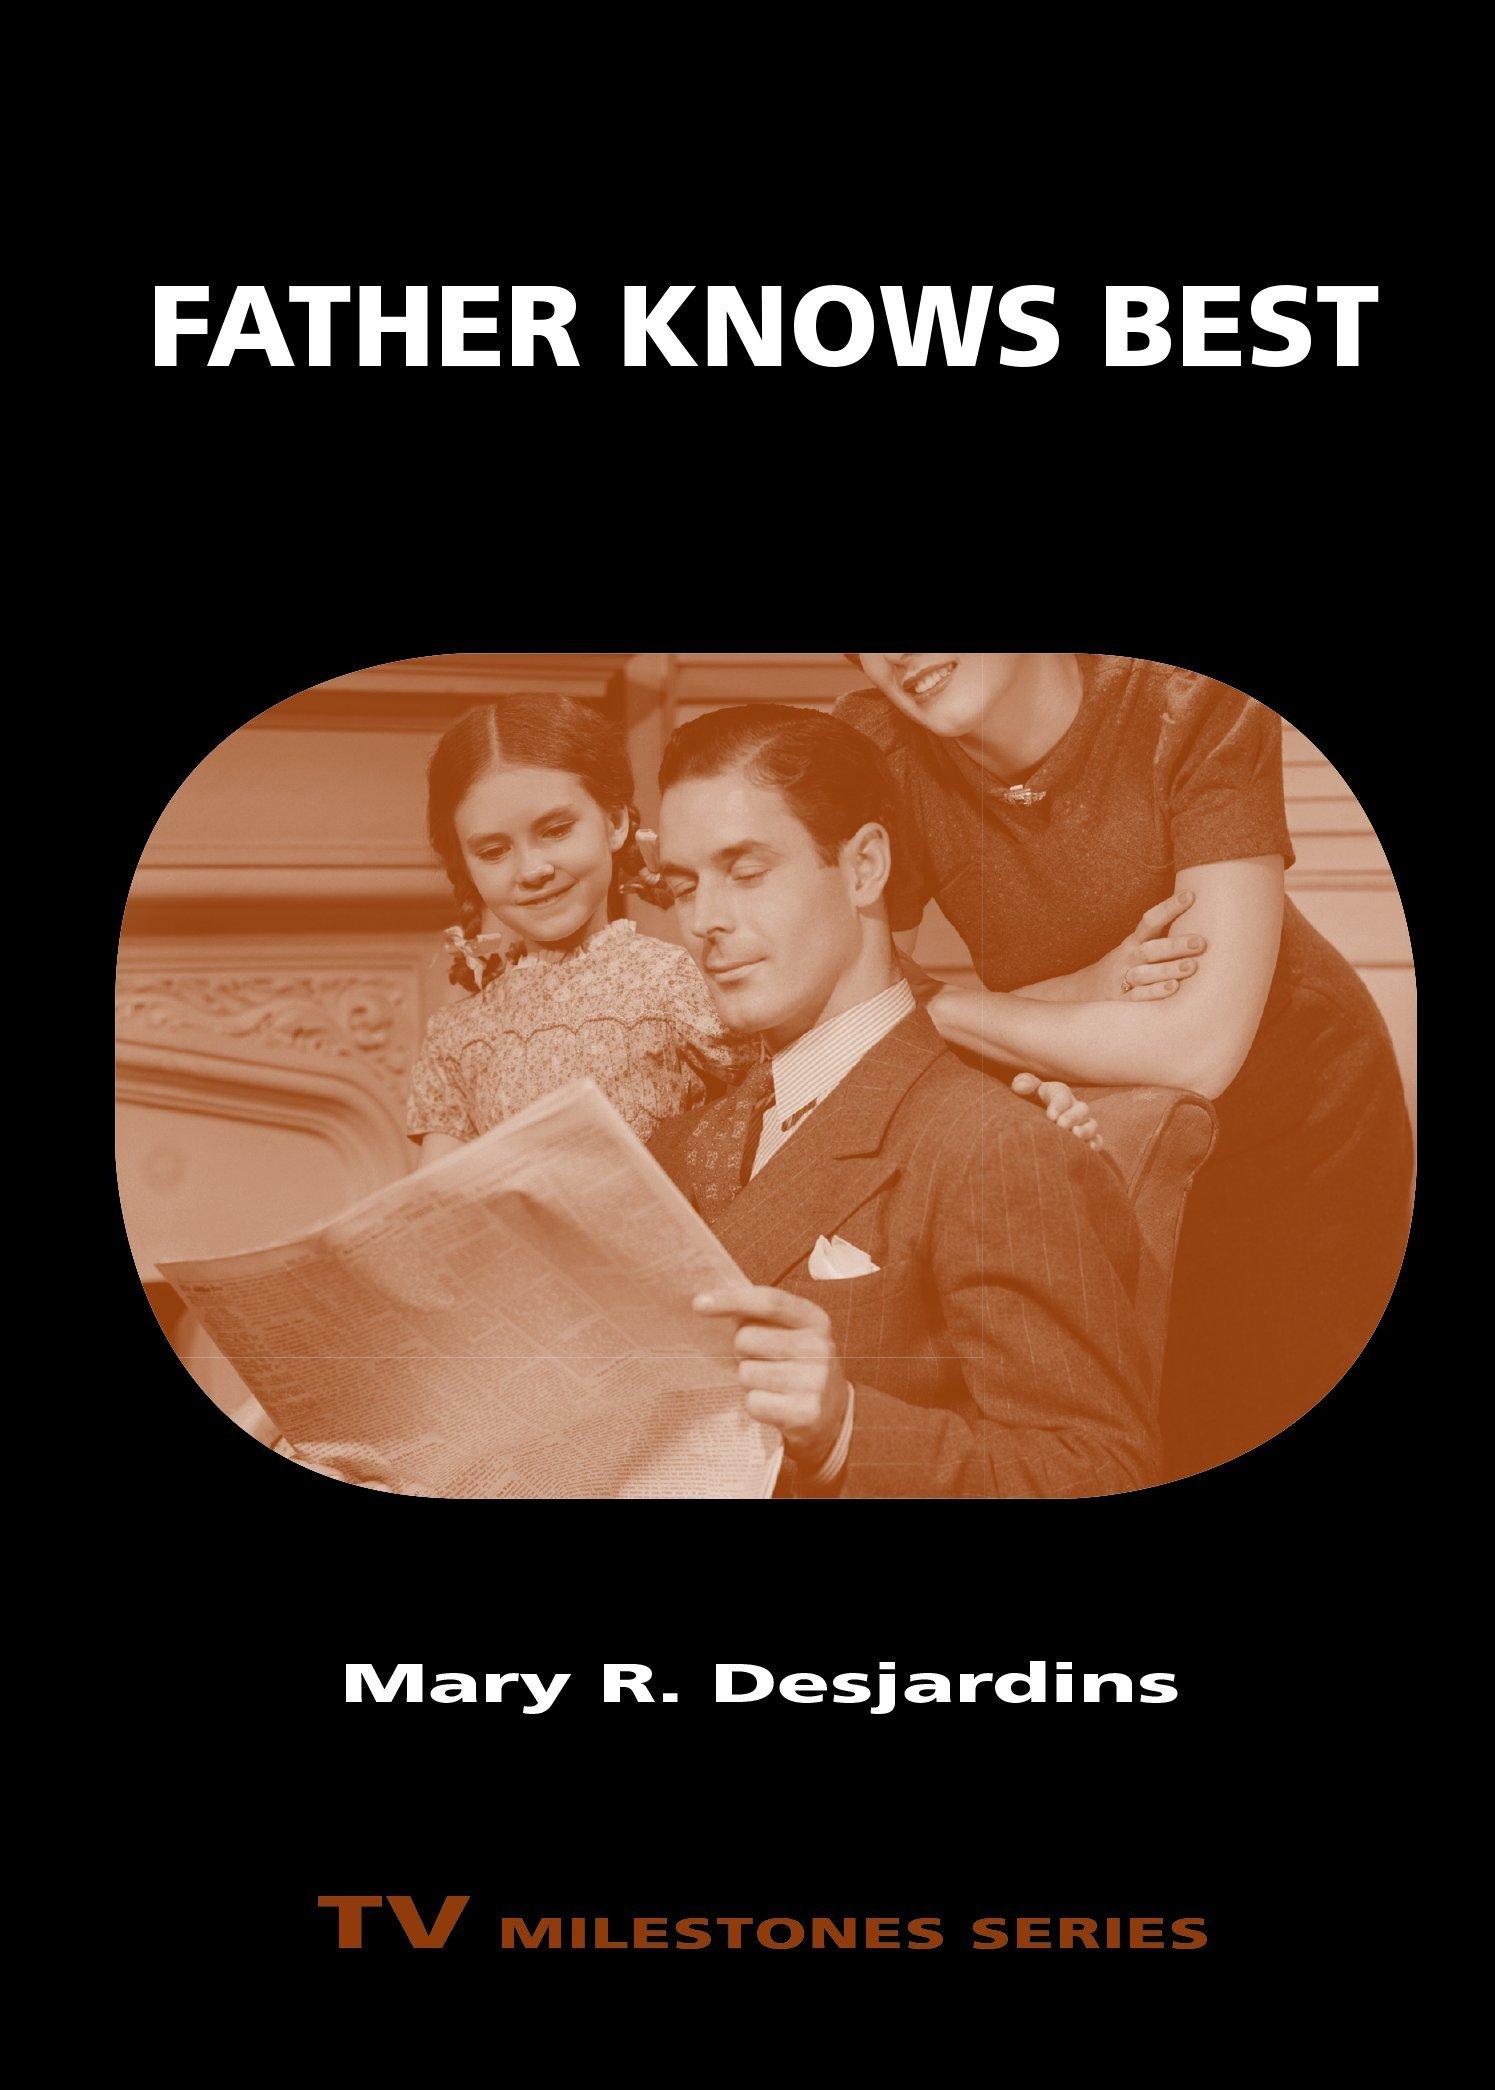 Father Knows Best (TV Milestones Series)